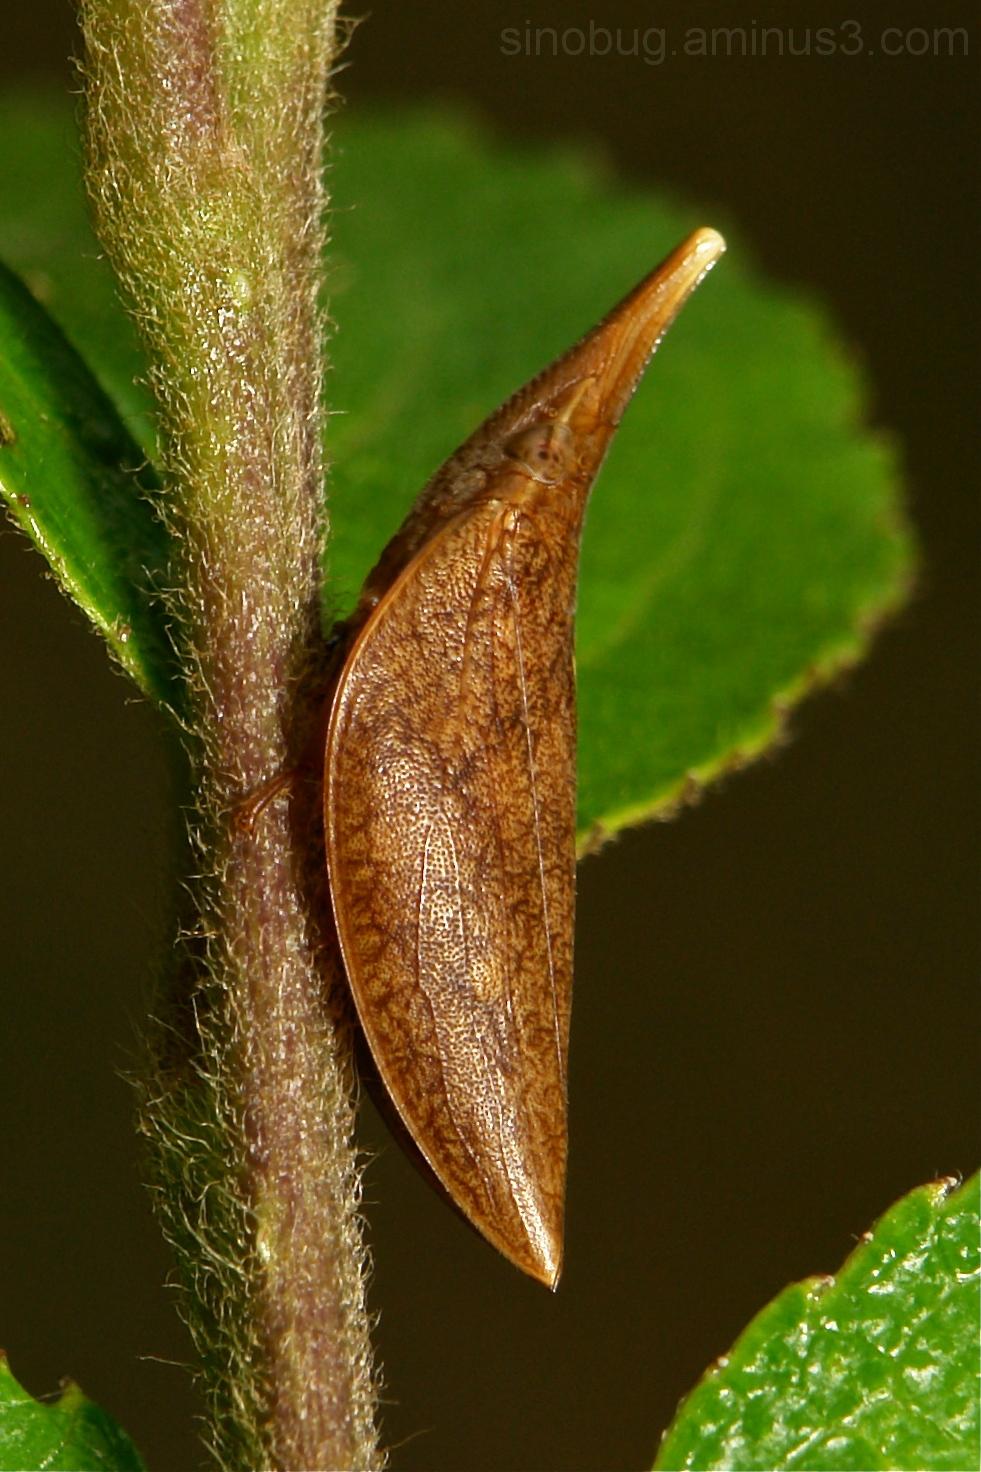 Spittlebug Philagra Aphrophoridae hopper China